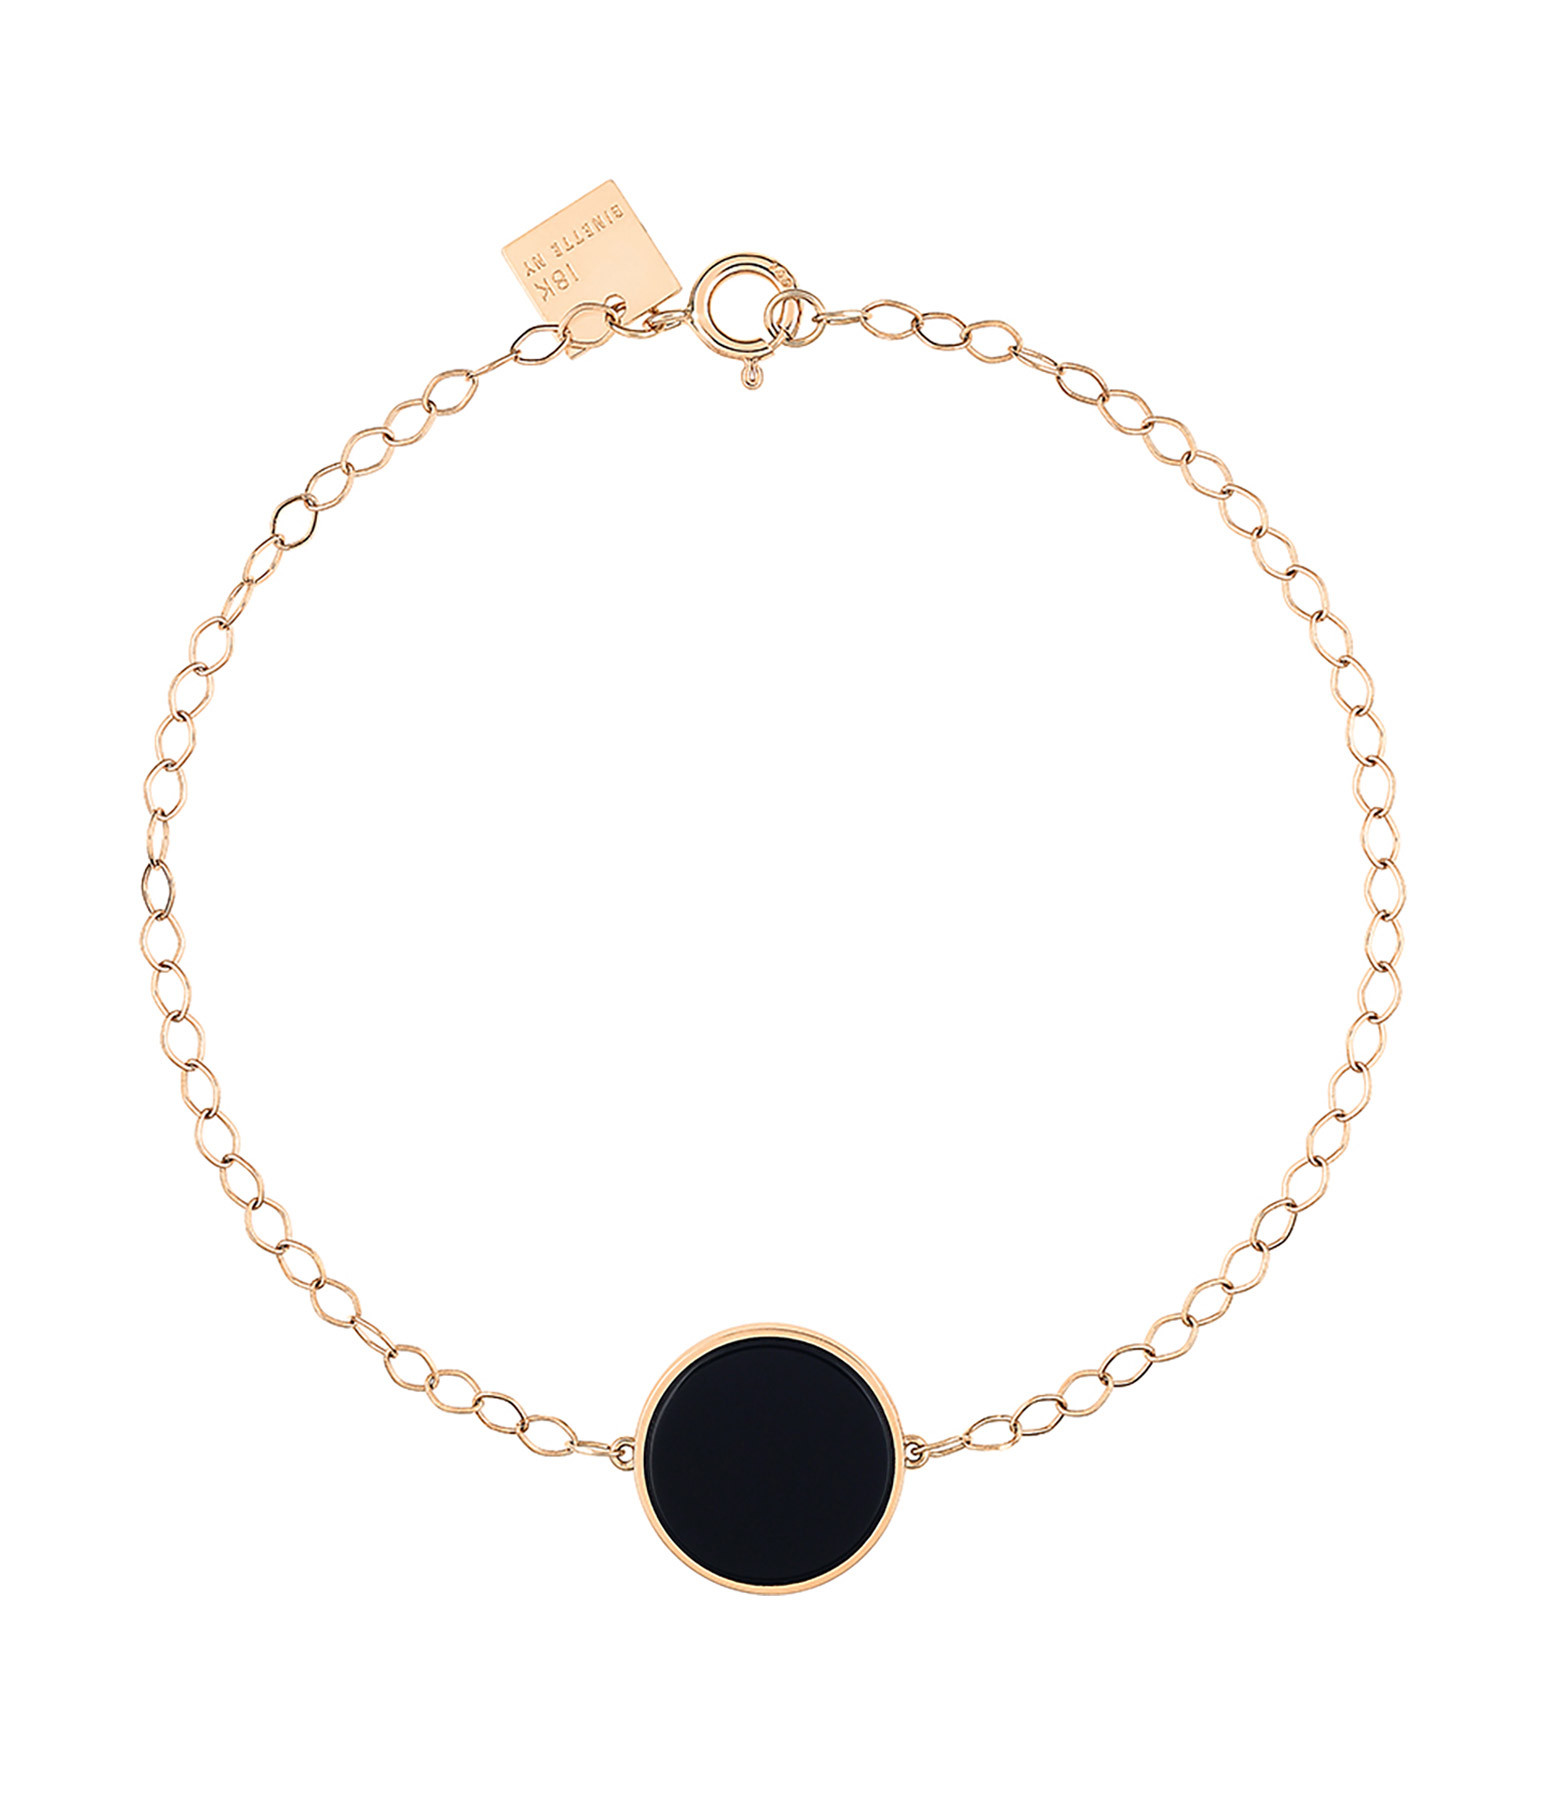 GINETTE_NY,Bracelet Ever Disc Onyx,lulli-sur-la-toile.com